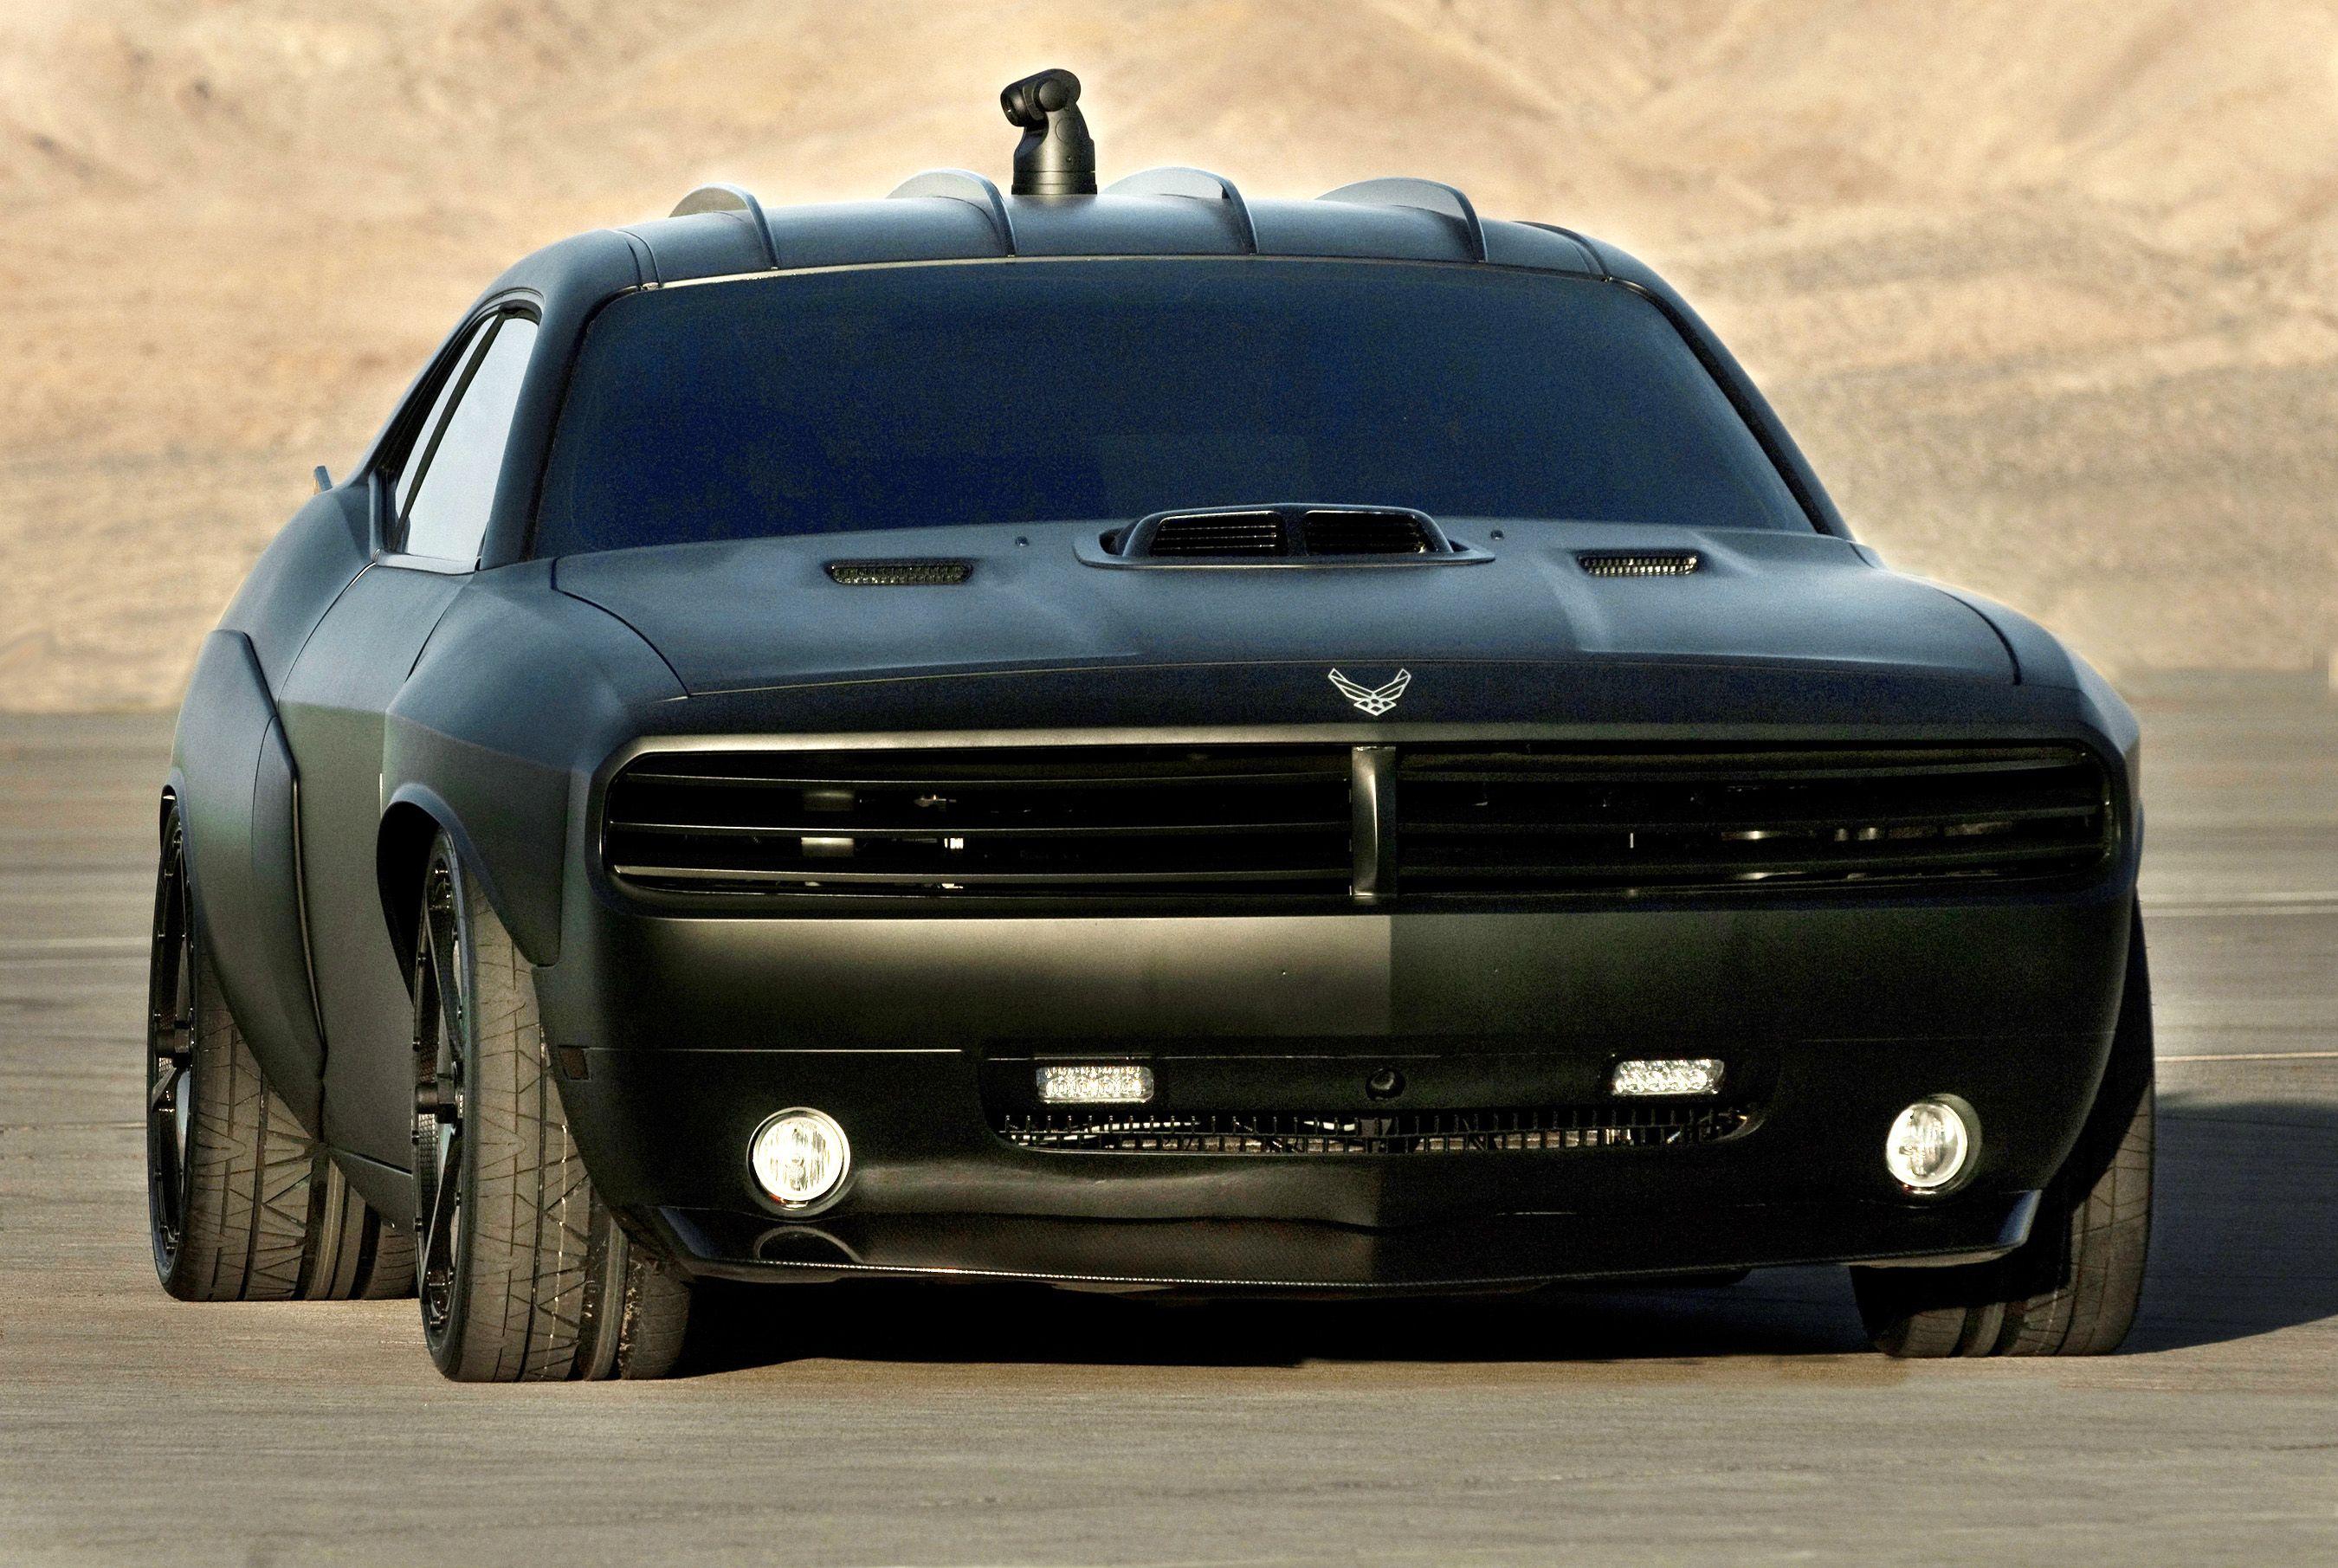 U.S. Air Force Car: Dodge Challenger Vapor ( black matte ) | Cars ...